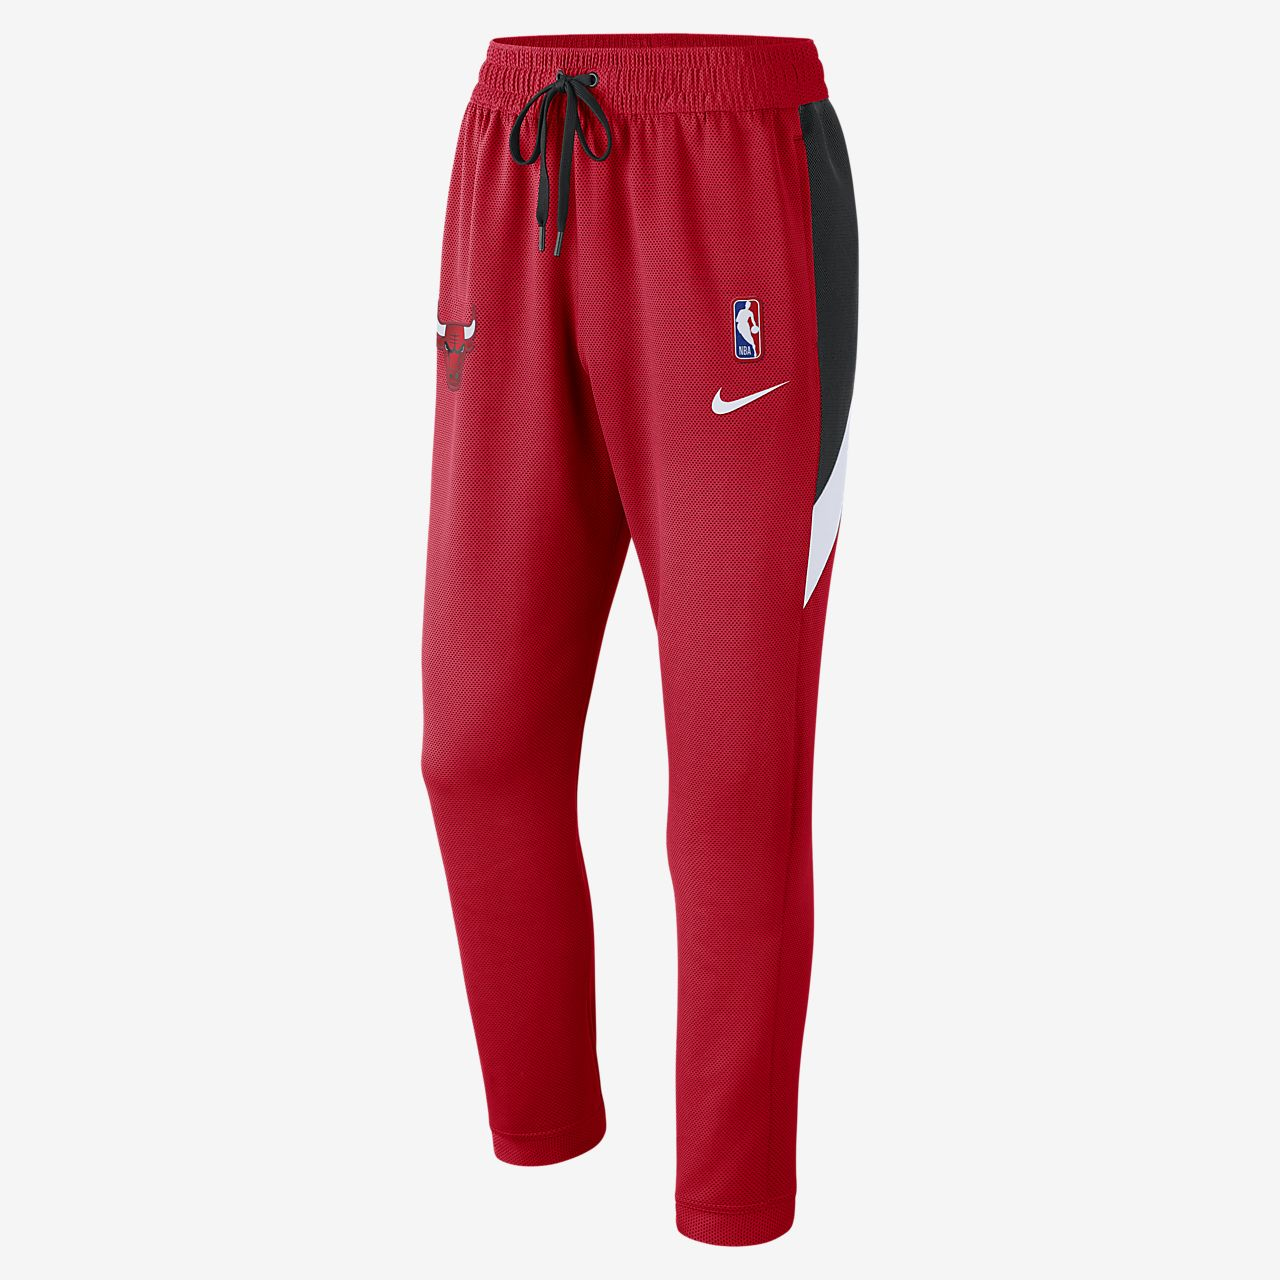 Chicago Bulls Nike Therma Flex Showtime Men's NBA Trousers